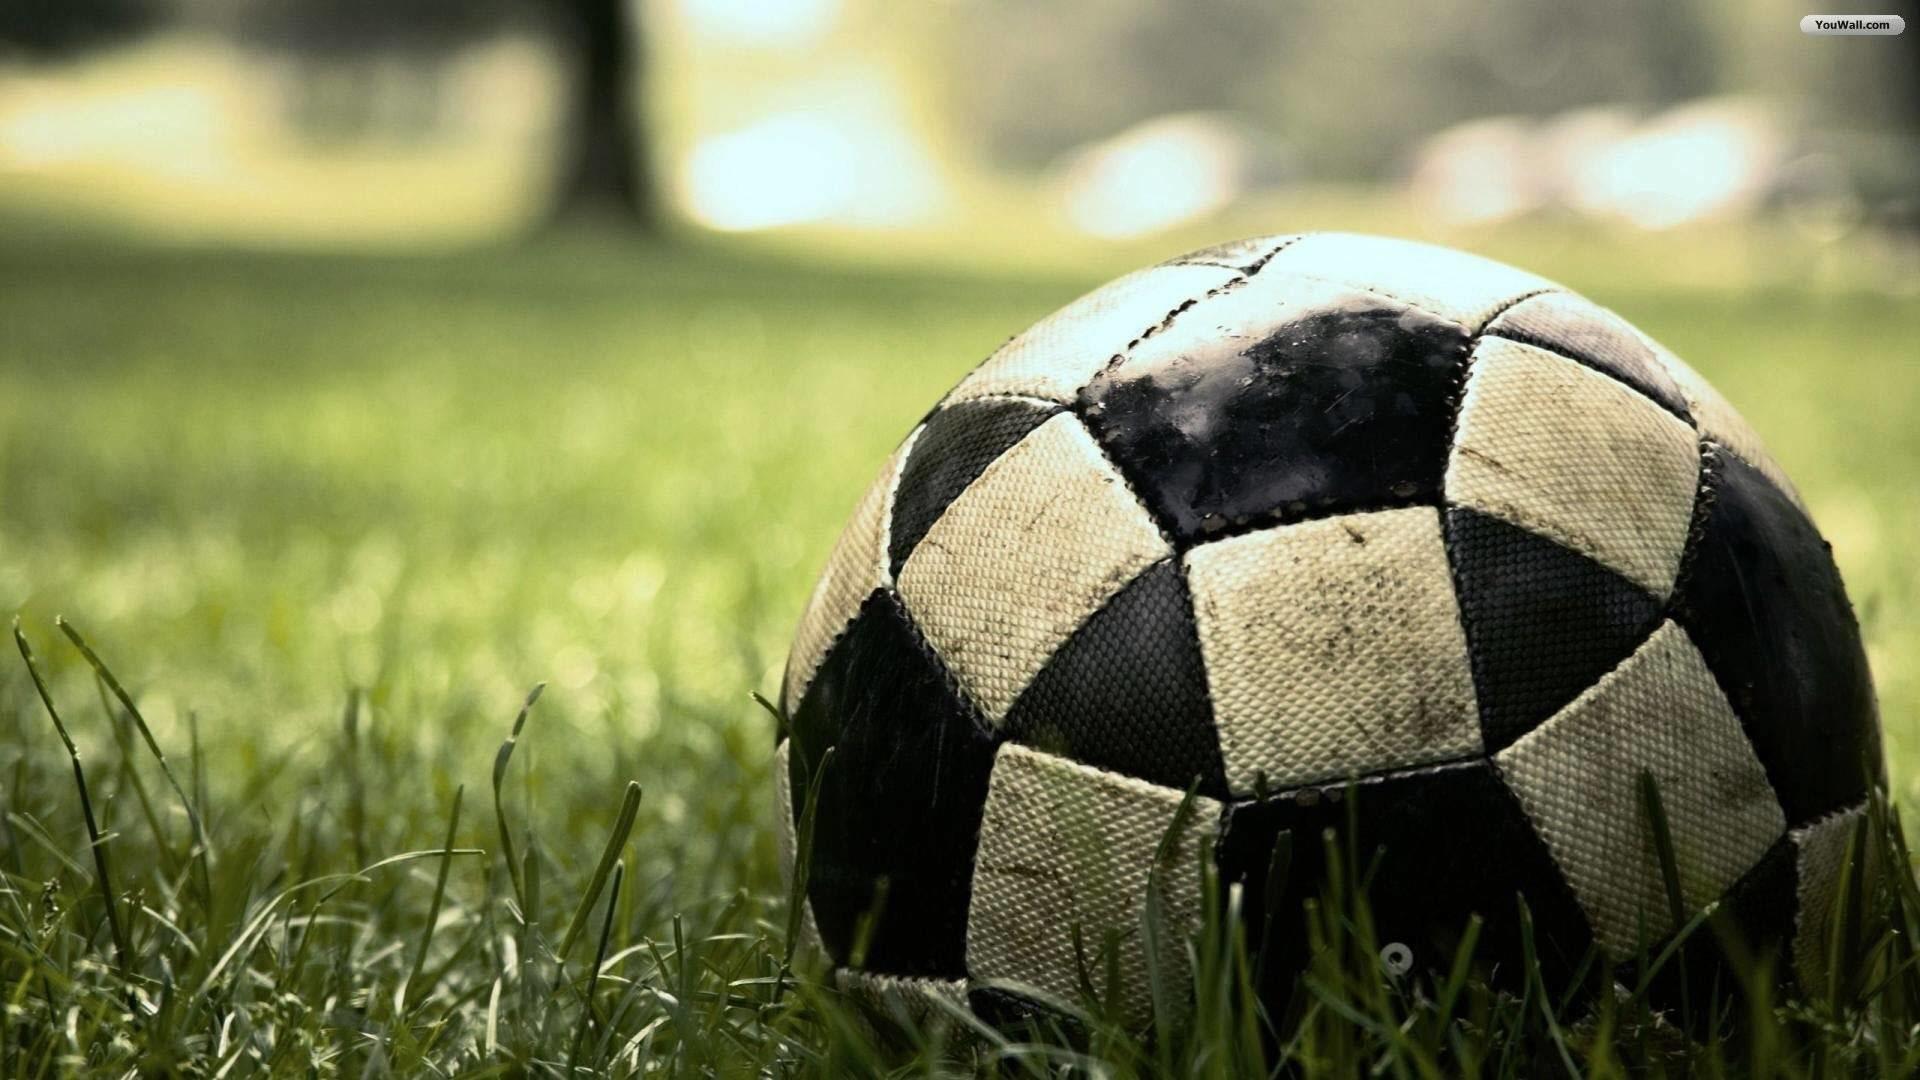 Soccer Iphone X Wallpaper Soccer Hd Wallpapers 183 ① Wallpapertag